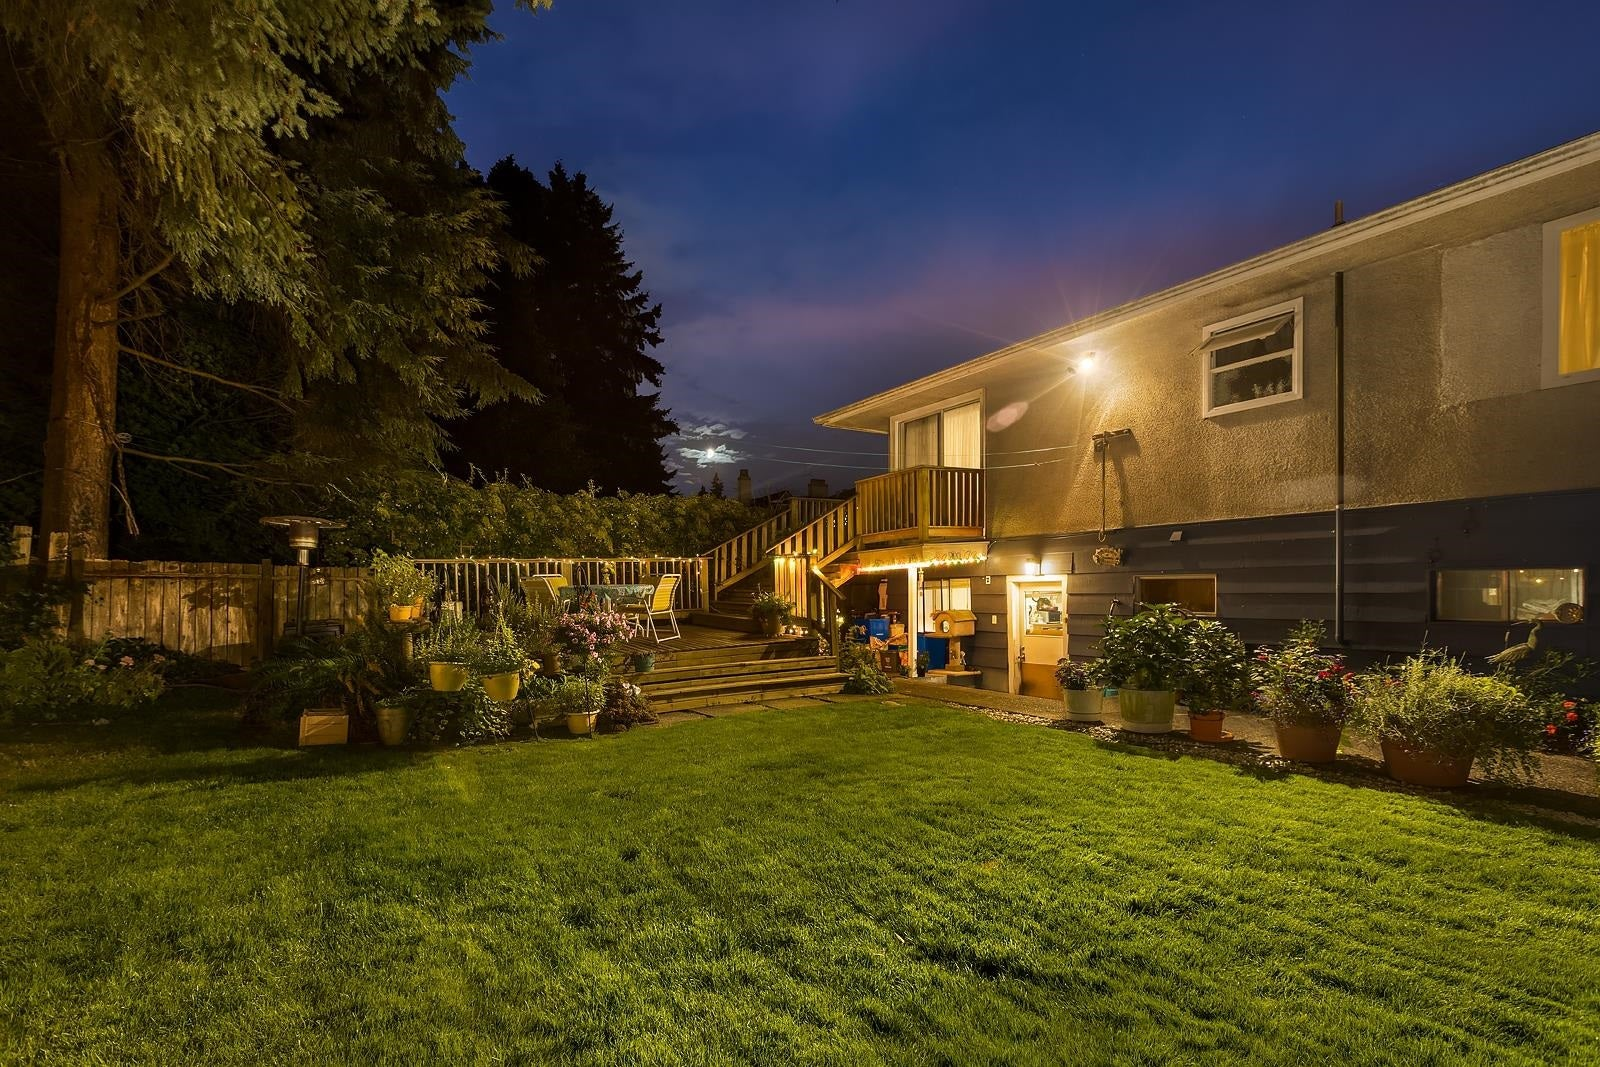 3495 WELLINGTON CRESCENT - Edgemont House/Single Family for sale, 3 Bedrooms (R2617949) - #16